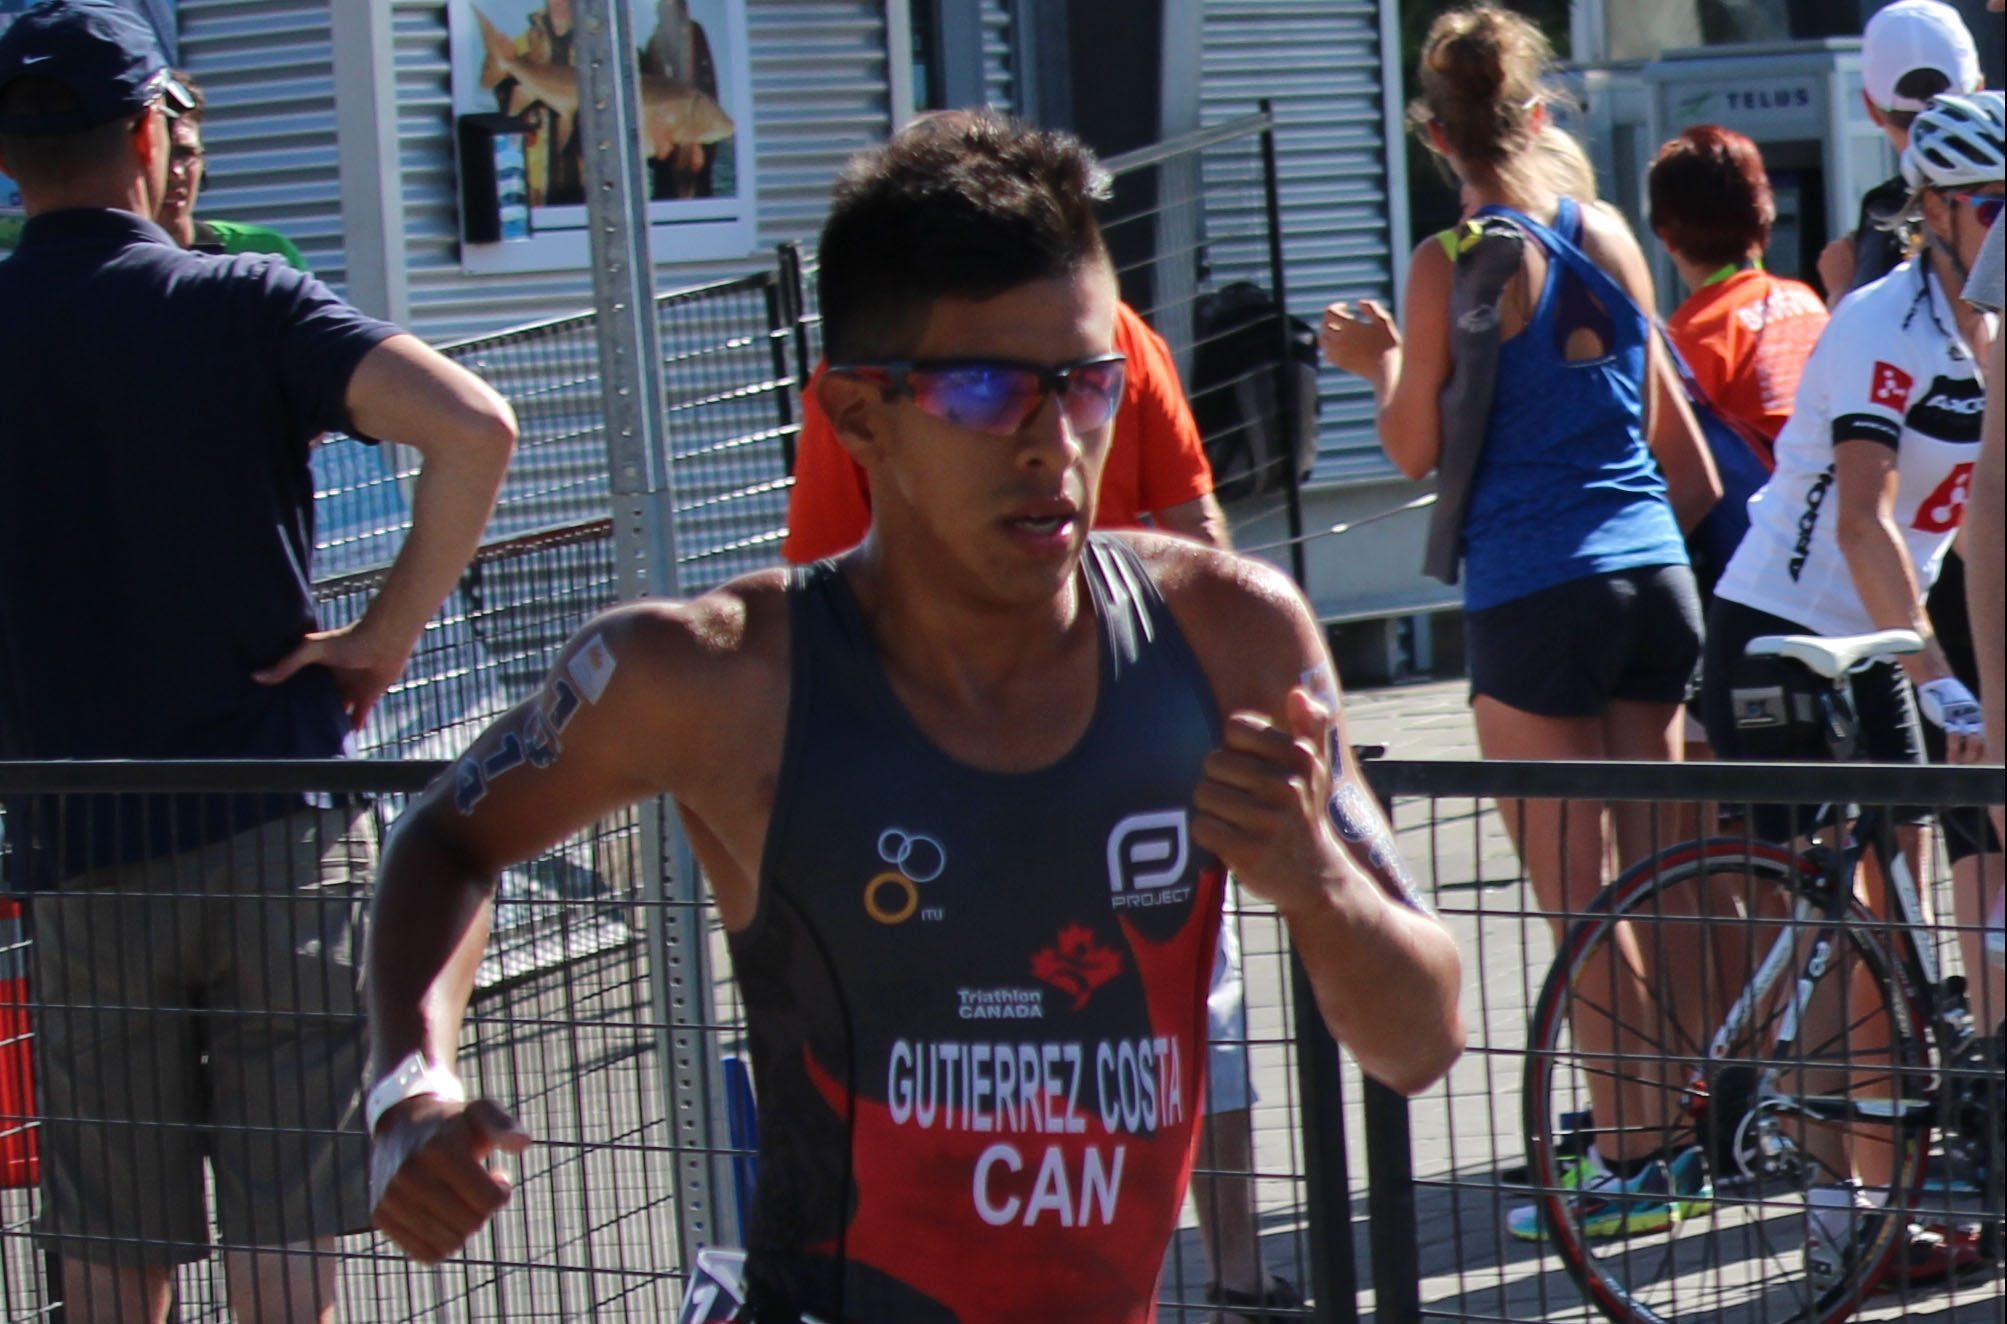 Marcos Gutierrez Costa rejoint Athlètes d'ici